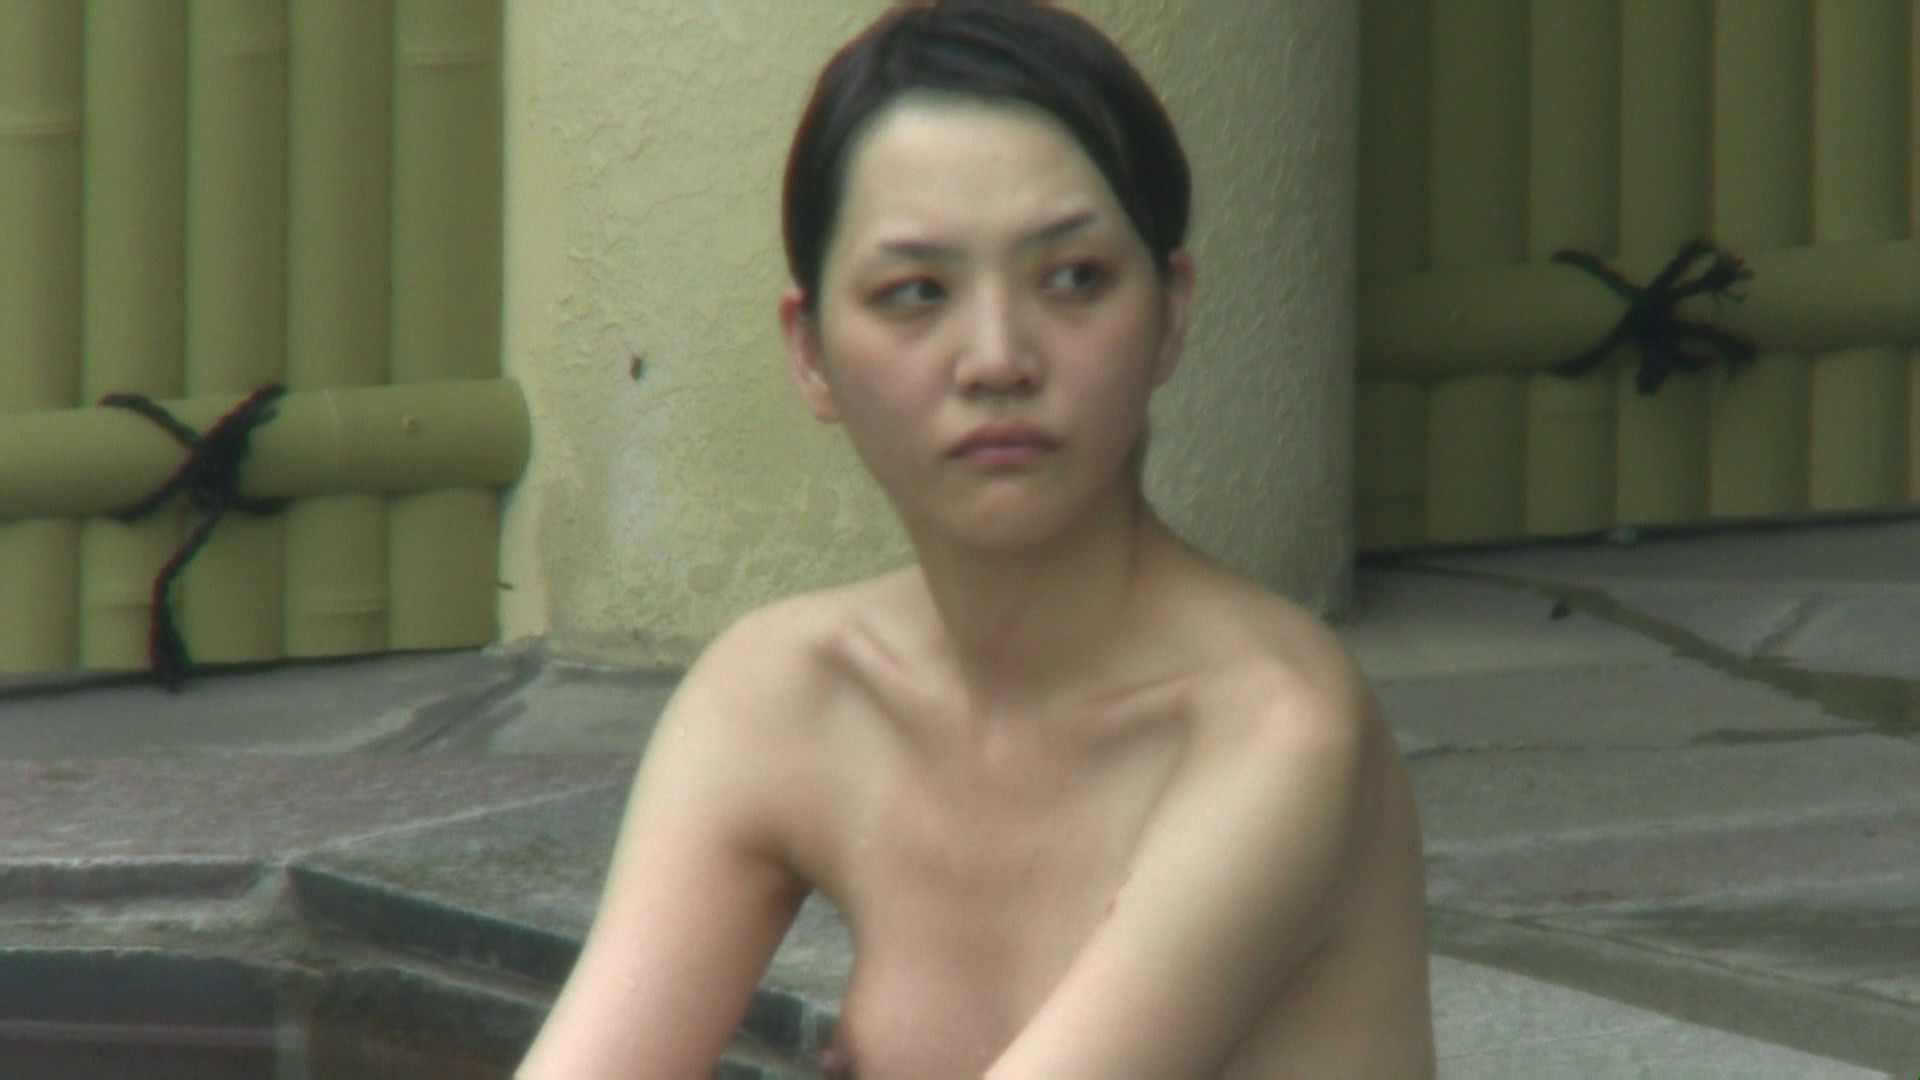 Aquaな露天風呂Vol.64【VIP限定】 露天風呂編 | 盗撮シリーズ  78PIX 15